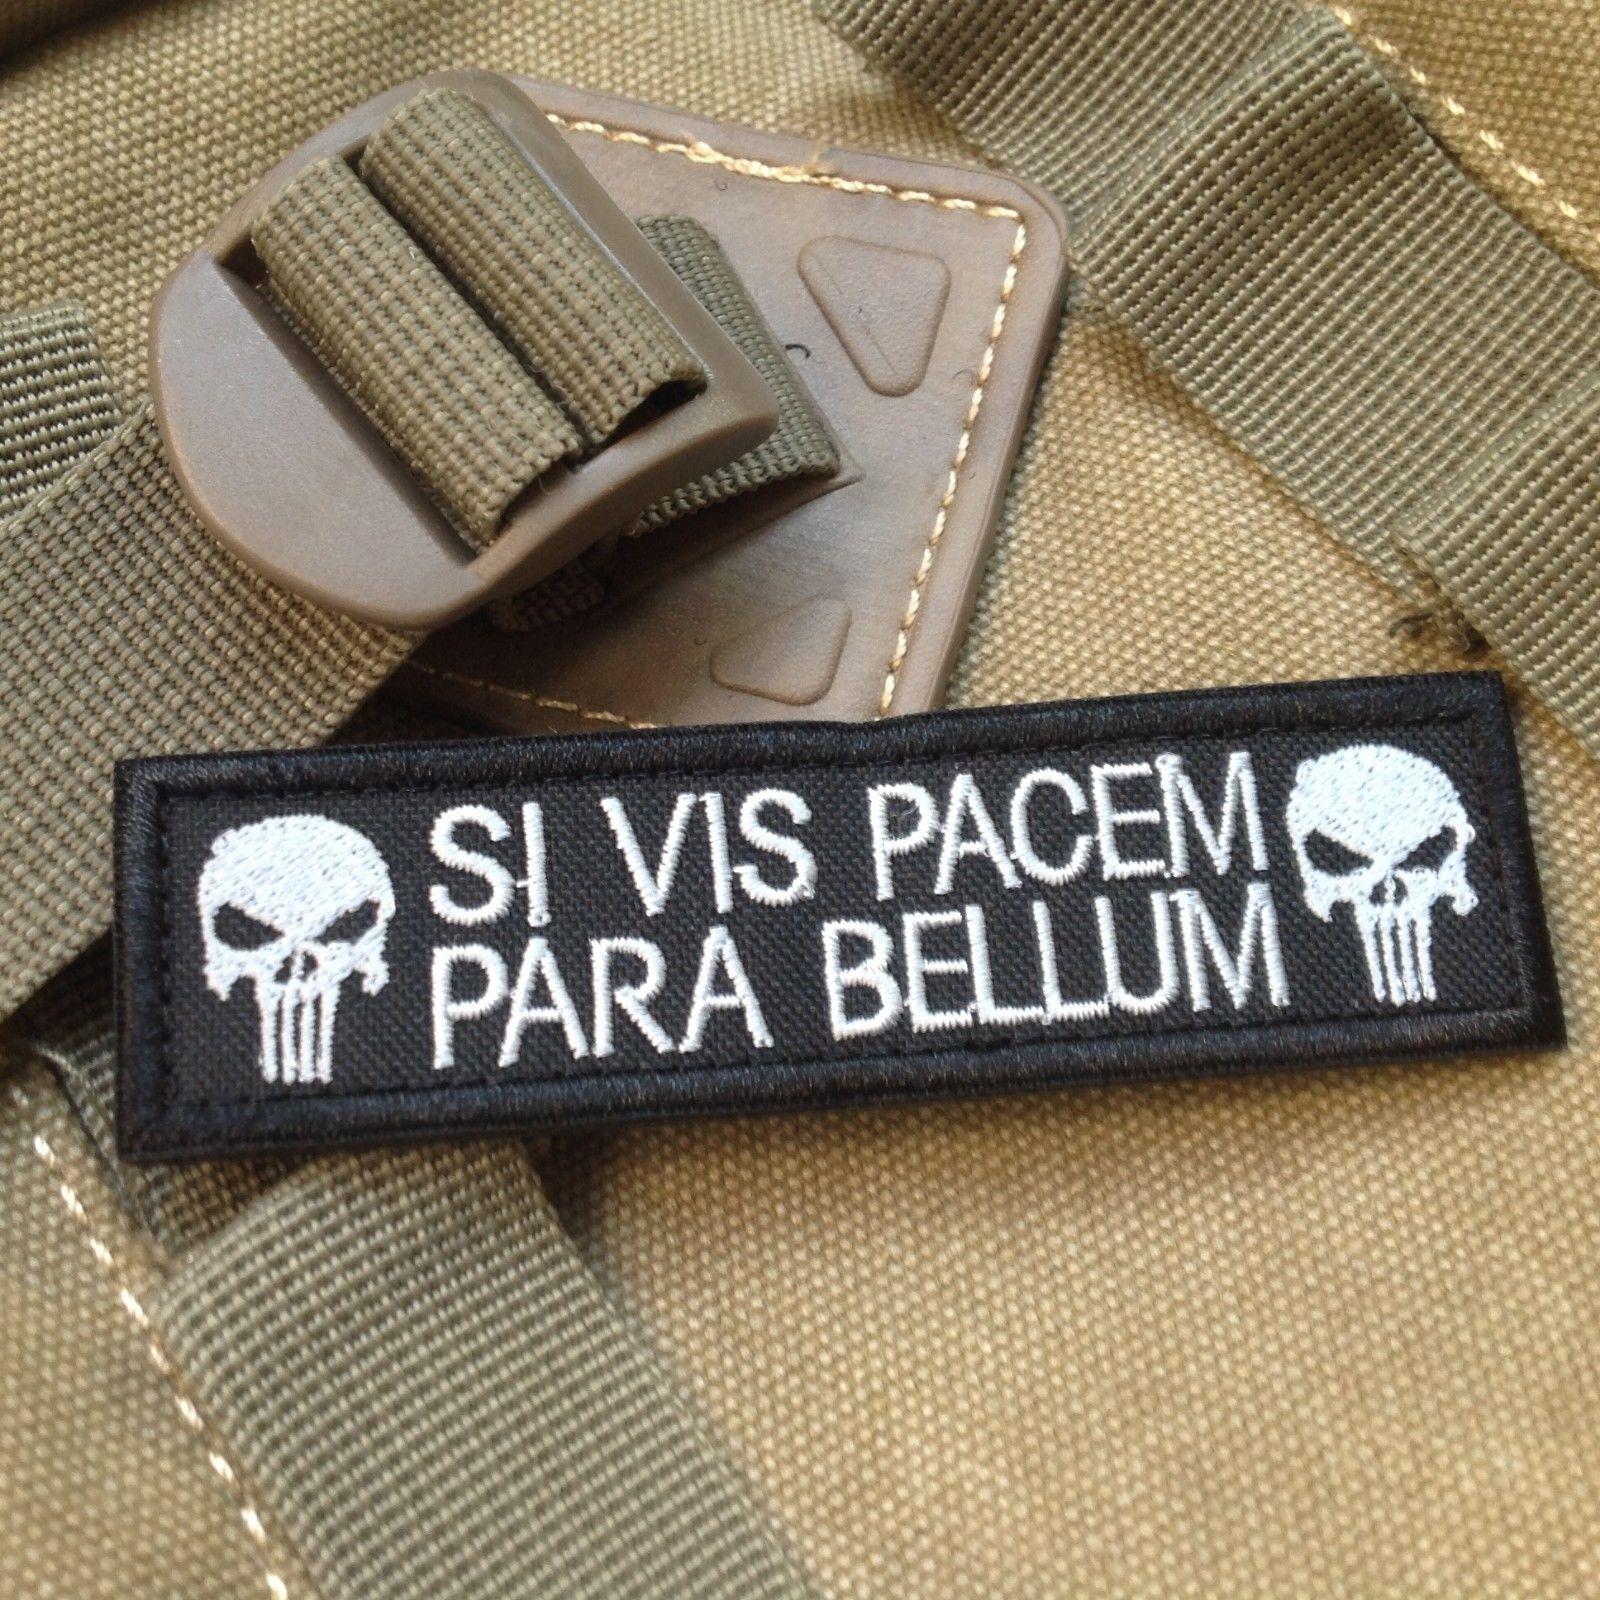 SI VIS PACEM PARA BELLUM, pegatina táctica militar 3D con bordado mágico, brazalete de gancho y bucle, pegatina militar negra